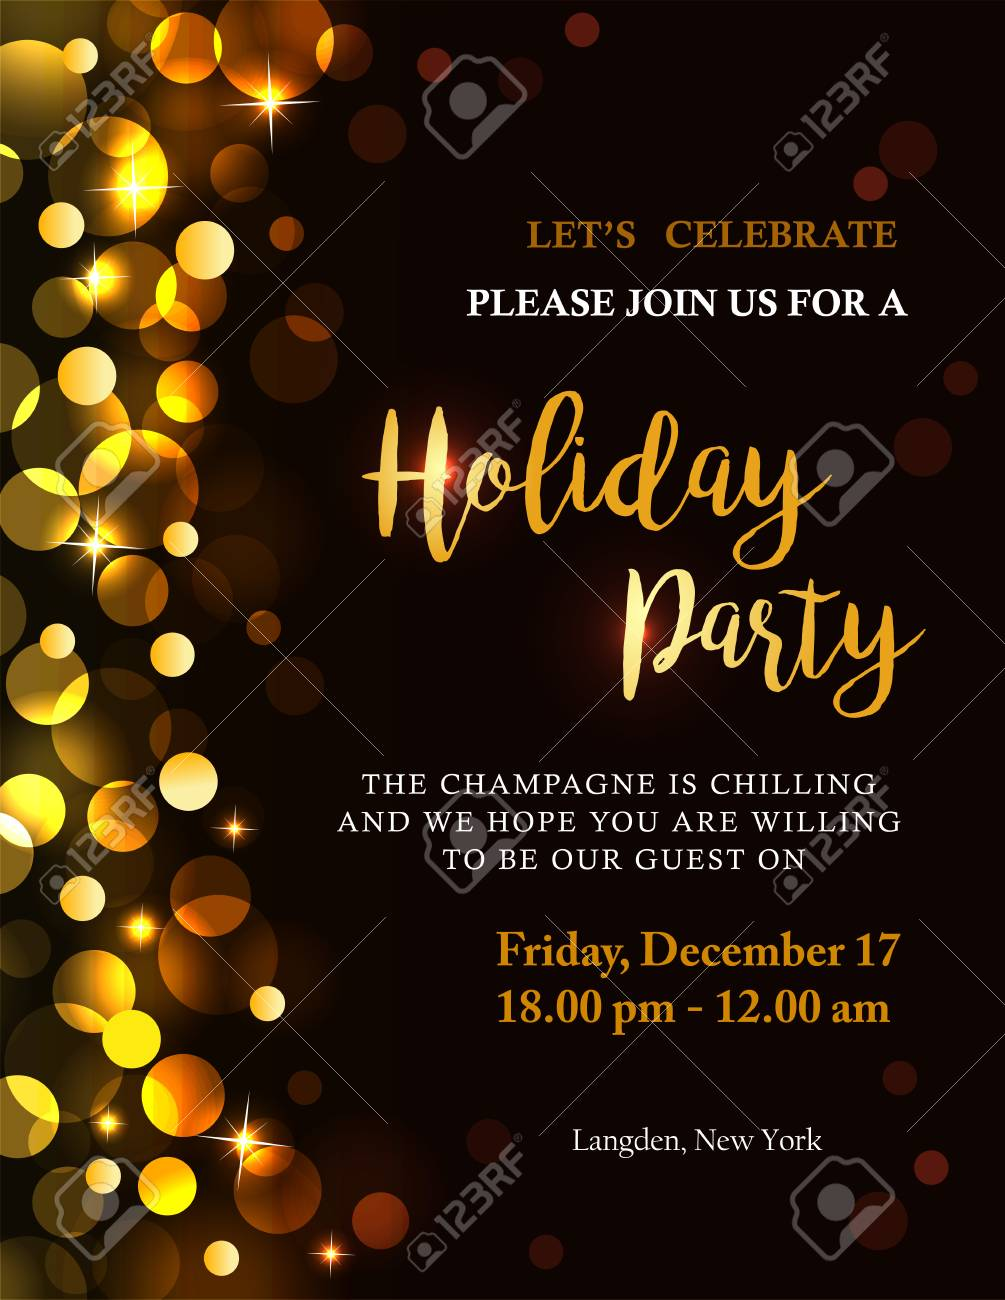 free holiday party invitation clipart #5